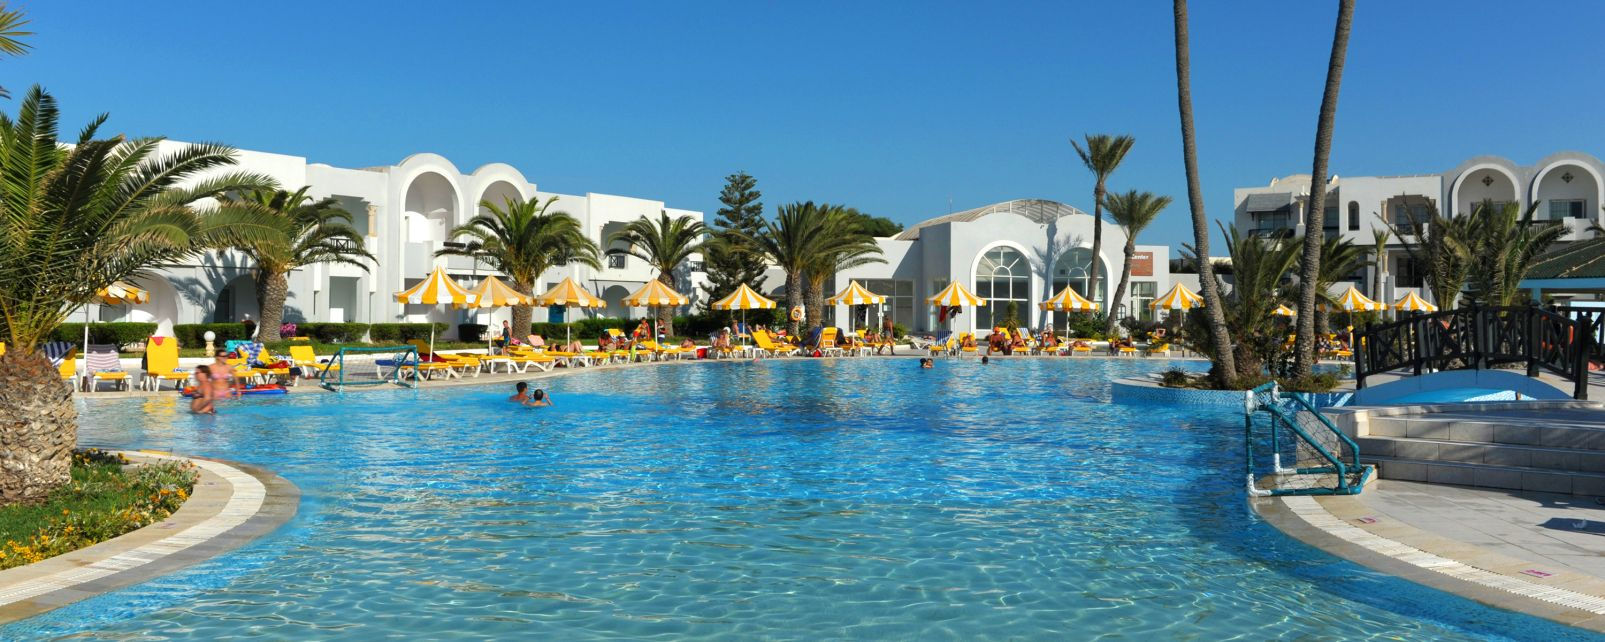 Hôtel Holiday Beach